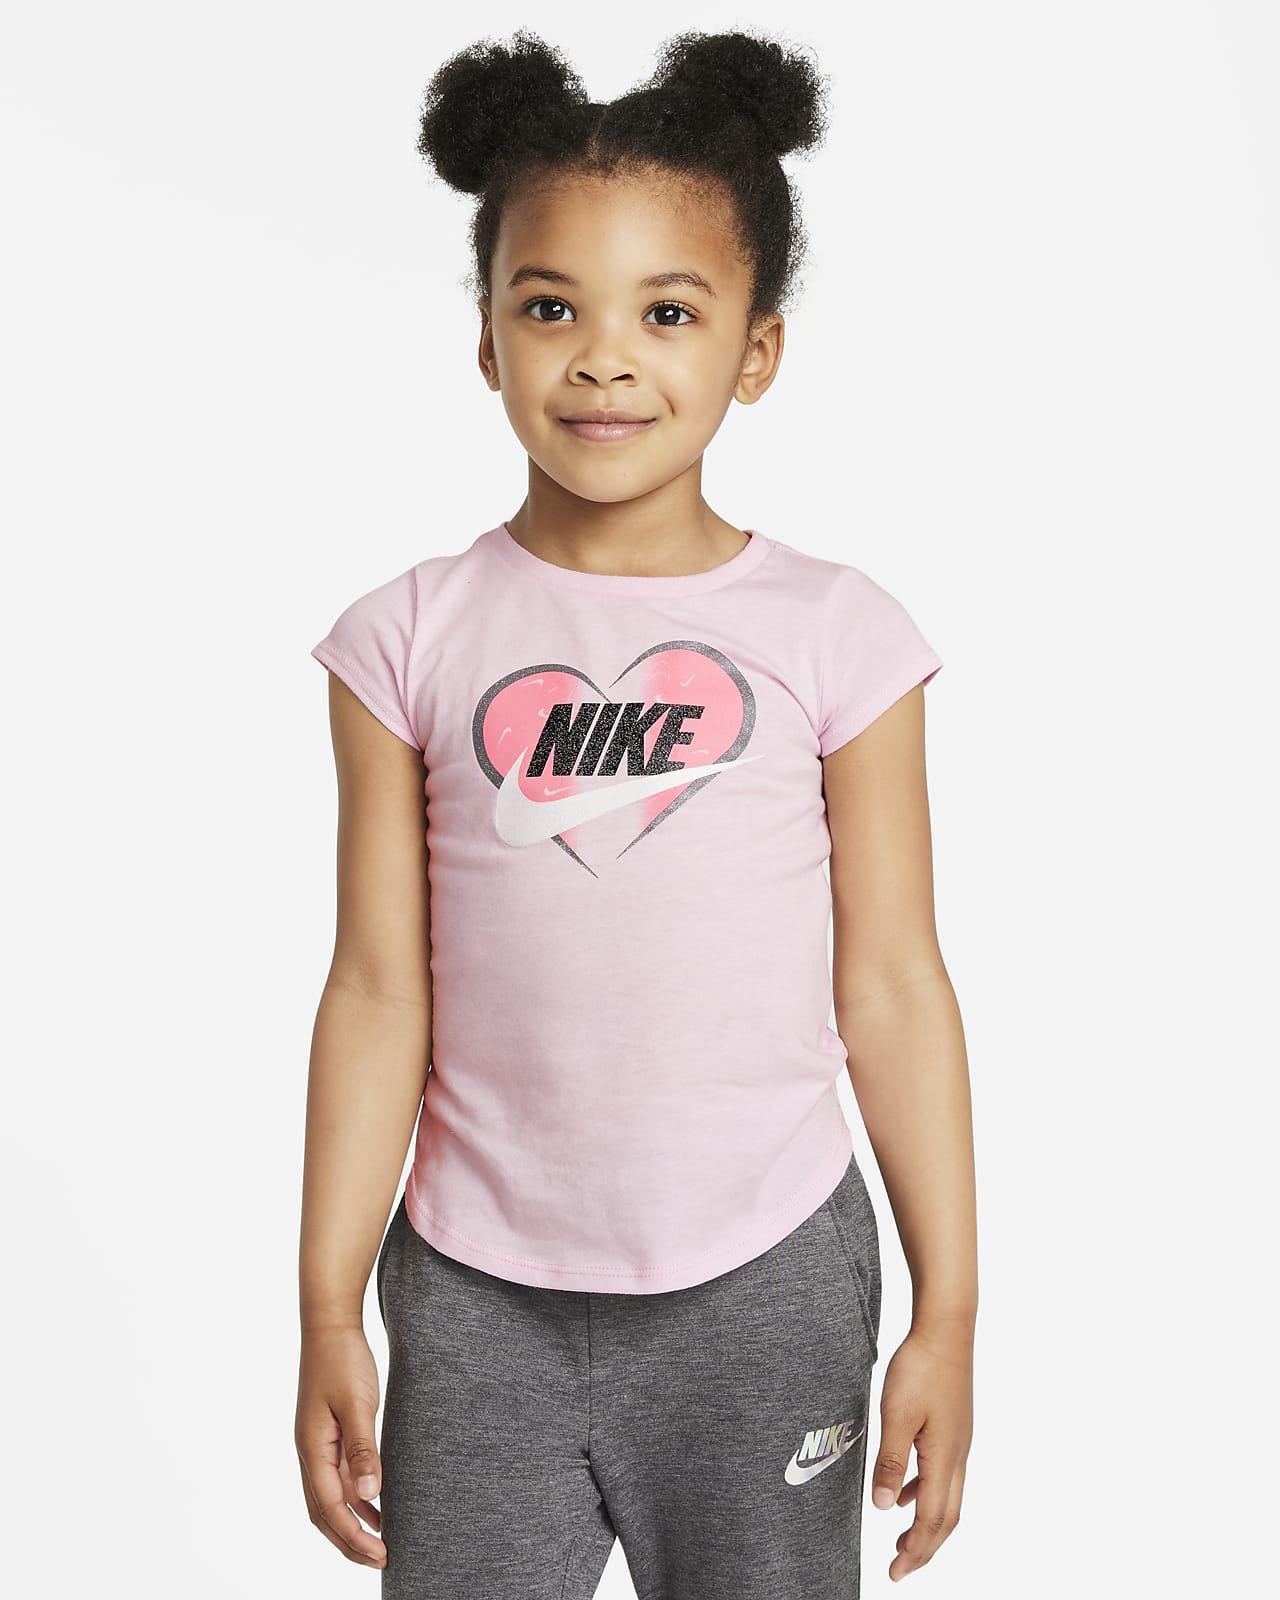 Tričko Nike pro batolata